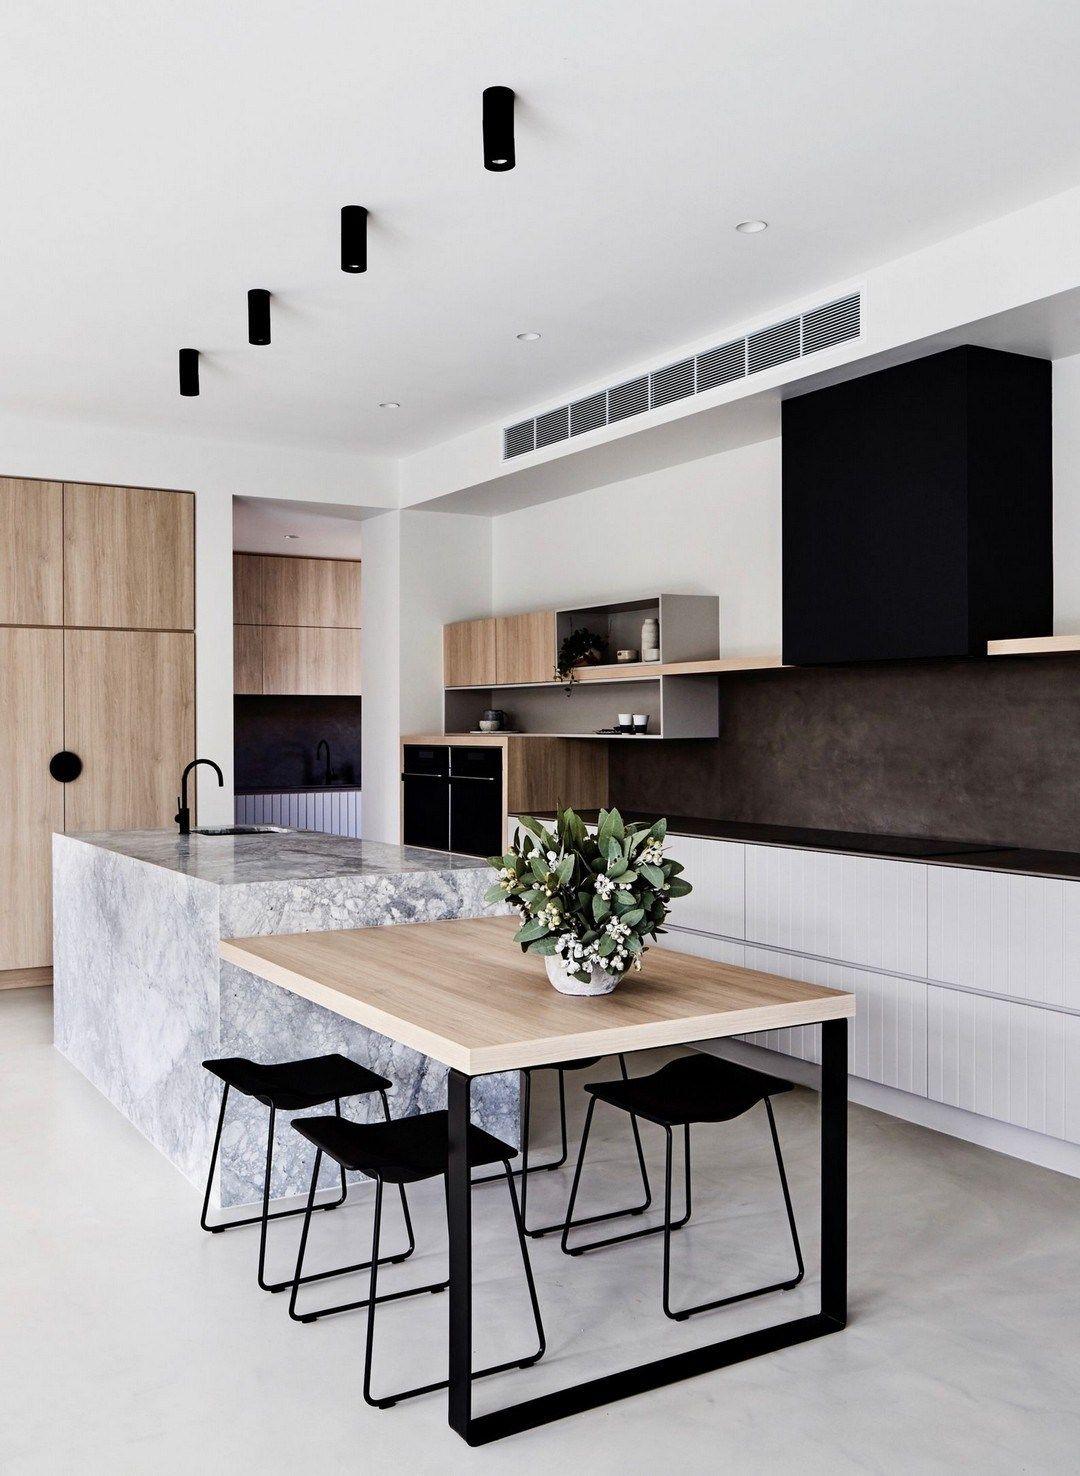 45 Awesome Modern Scandinavian Kitchen Ideas 19 Moderne Kuche Kuchen Design Interior Modern